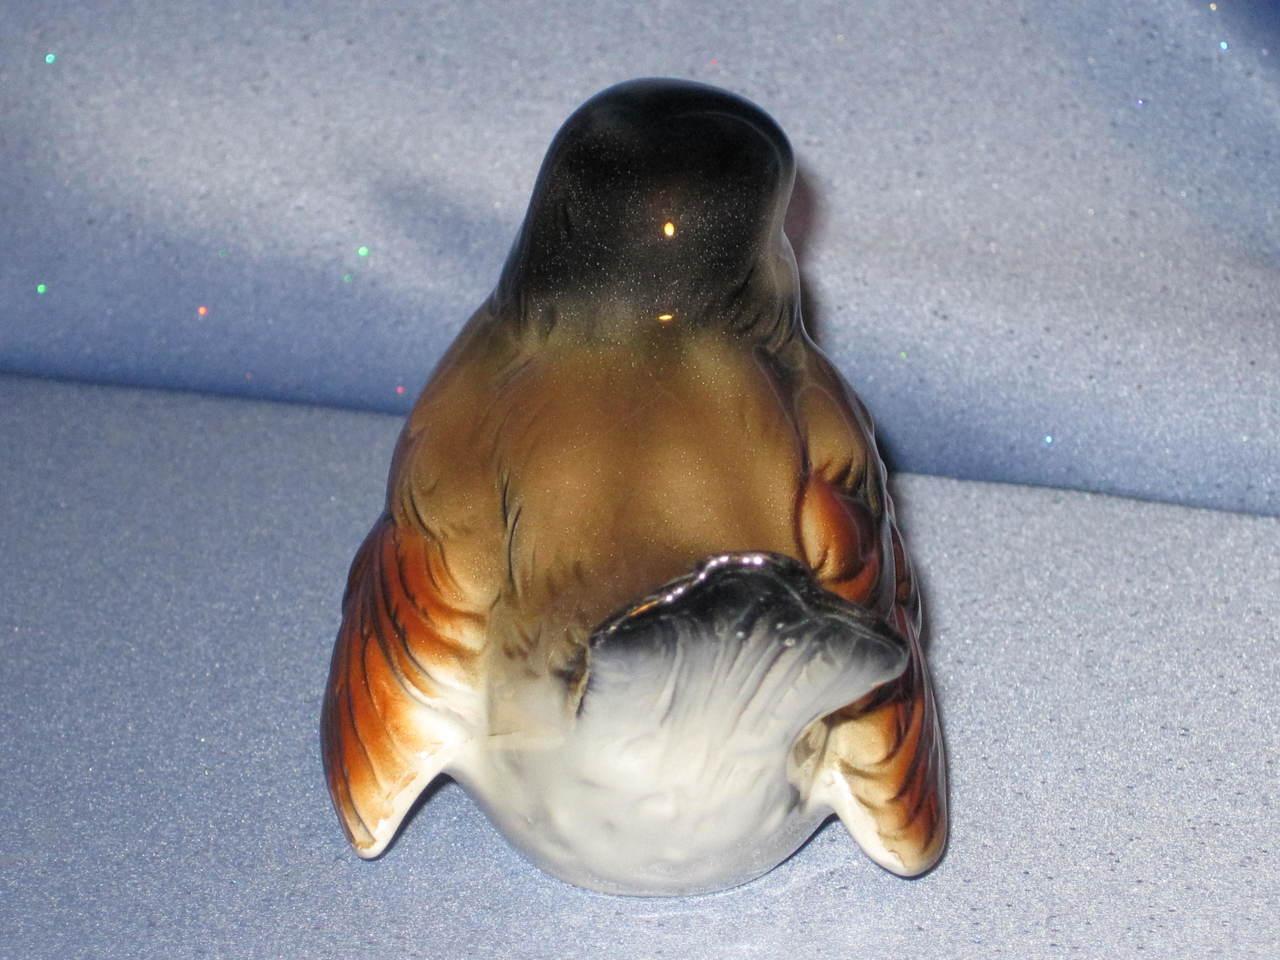 Brown Bird Figurine by W. Goebel (Looking Straight Forward).